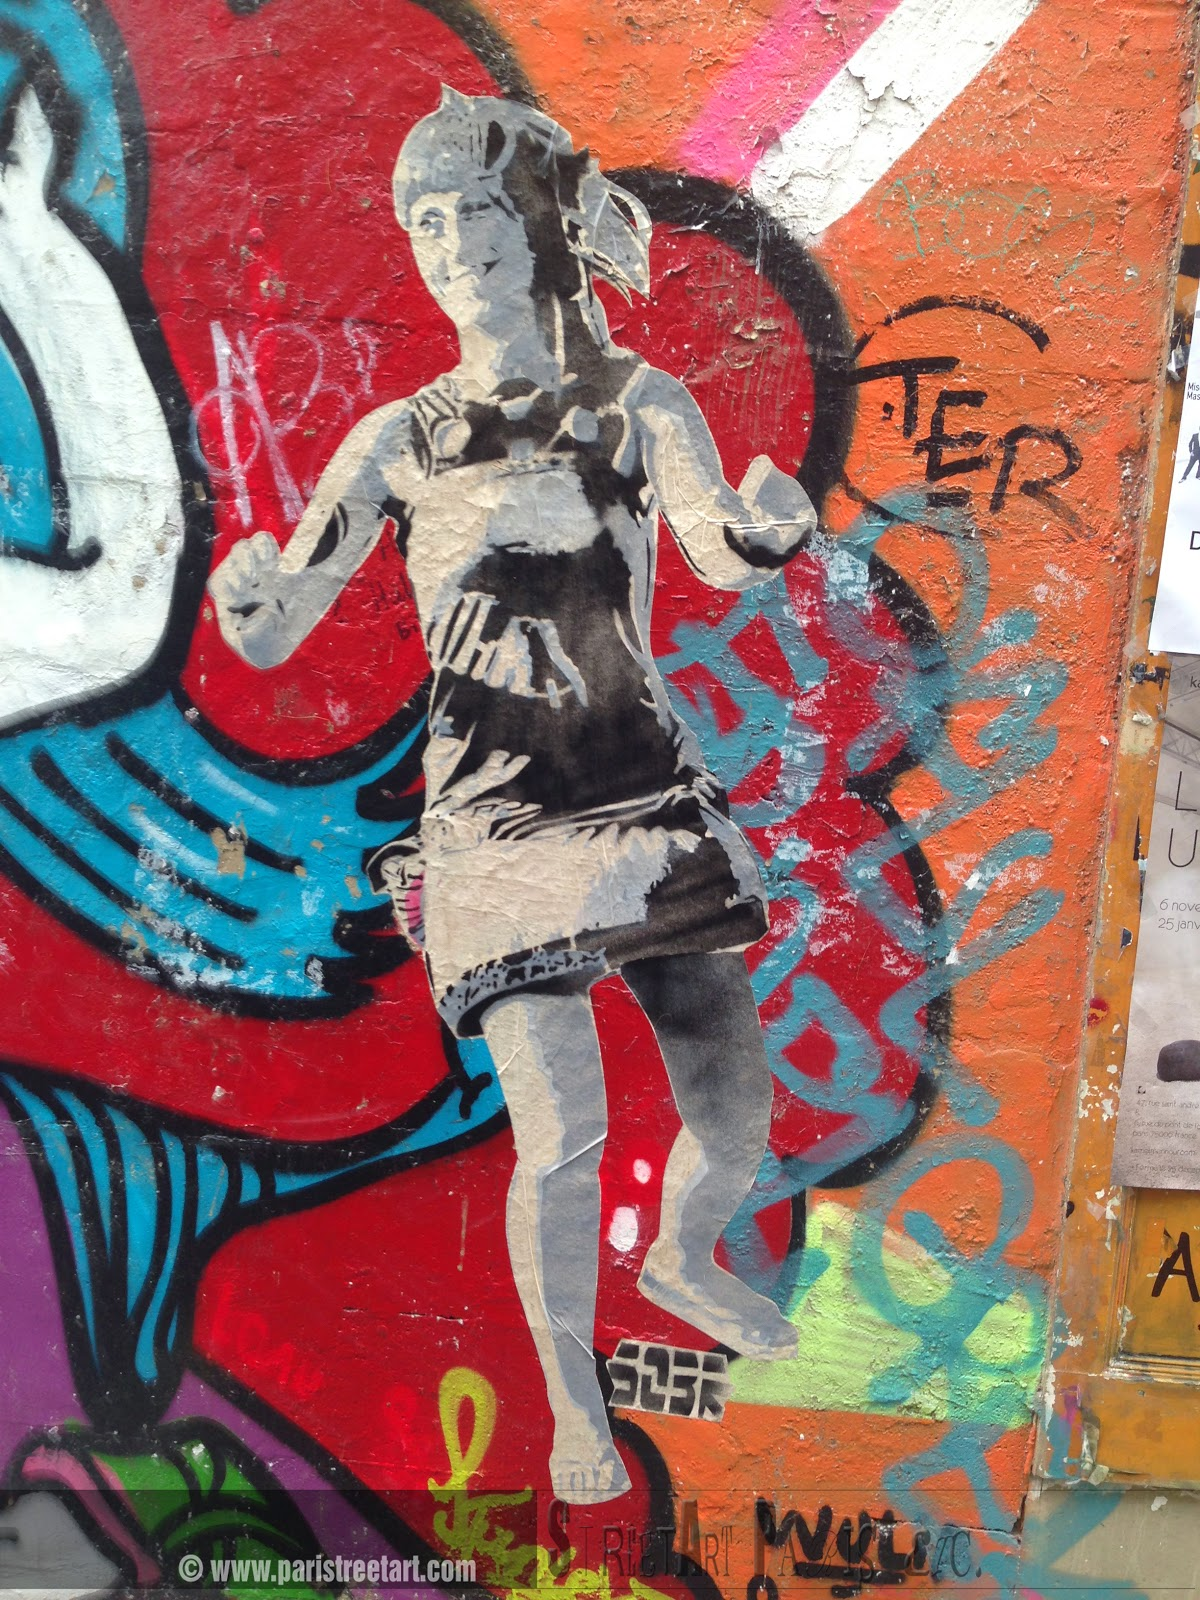 Exceptionnel Street Art Paris etc.: IT'S TIME to DANCE! project by SOBR CE96